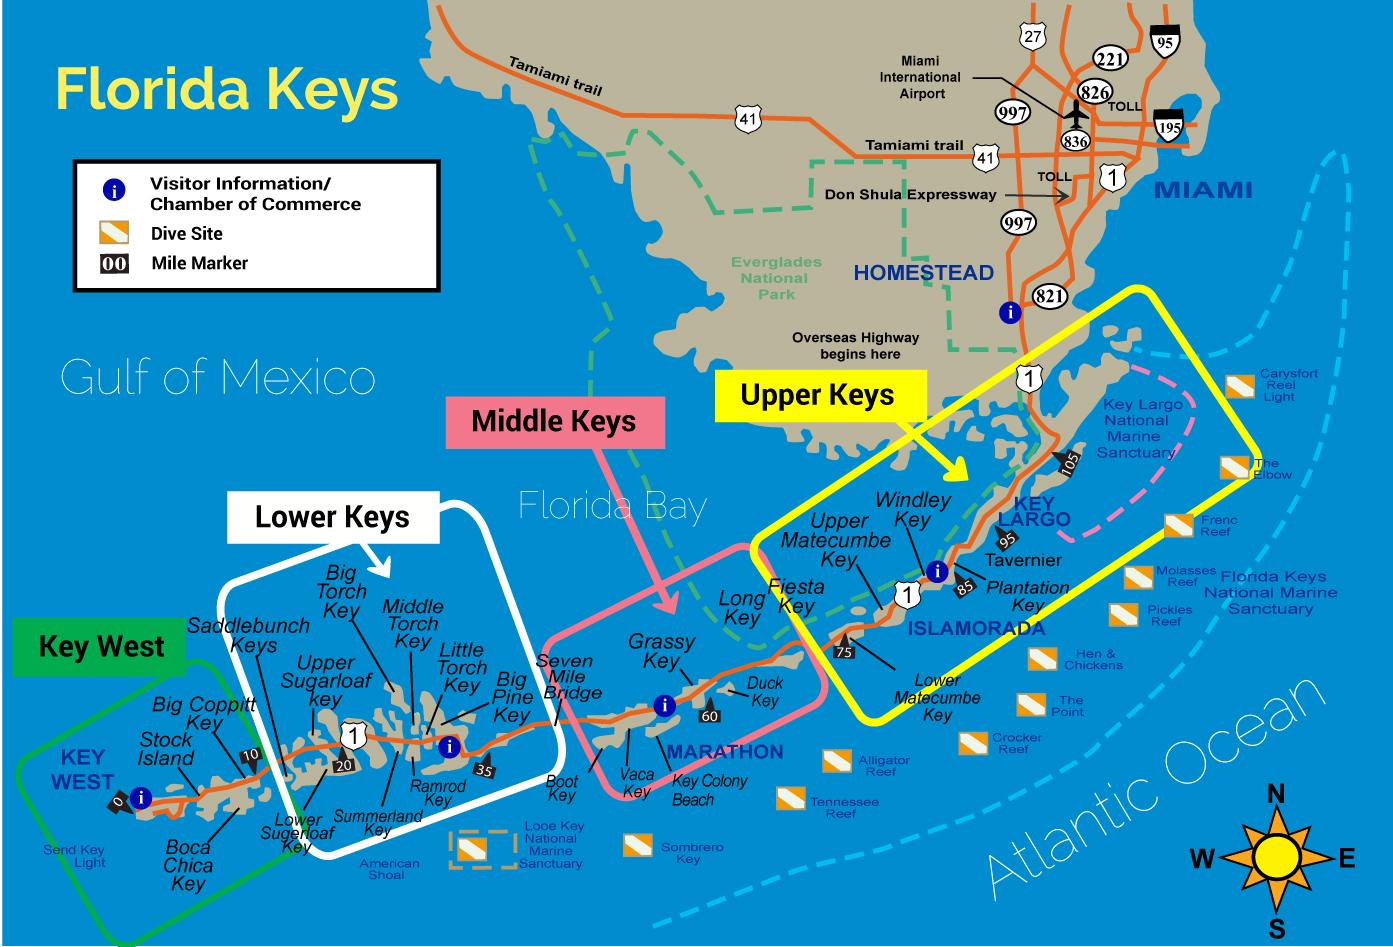 Map Of Florida Keys Beaches.Wildlife Bridges Beaches Friends Middle Lower Keys Fl